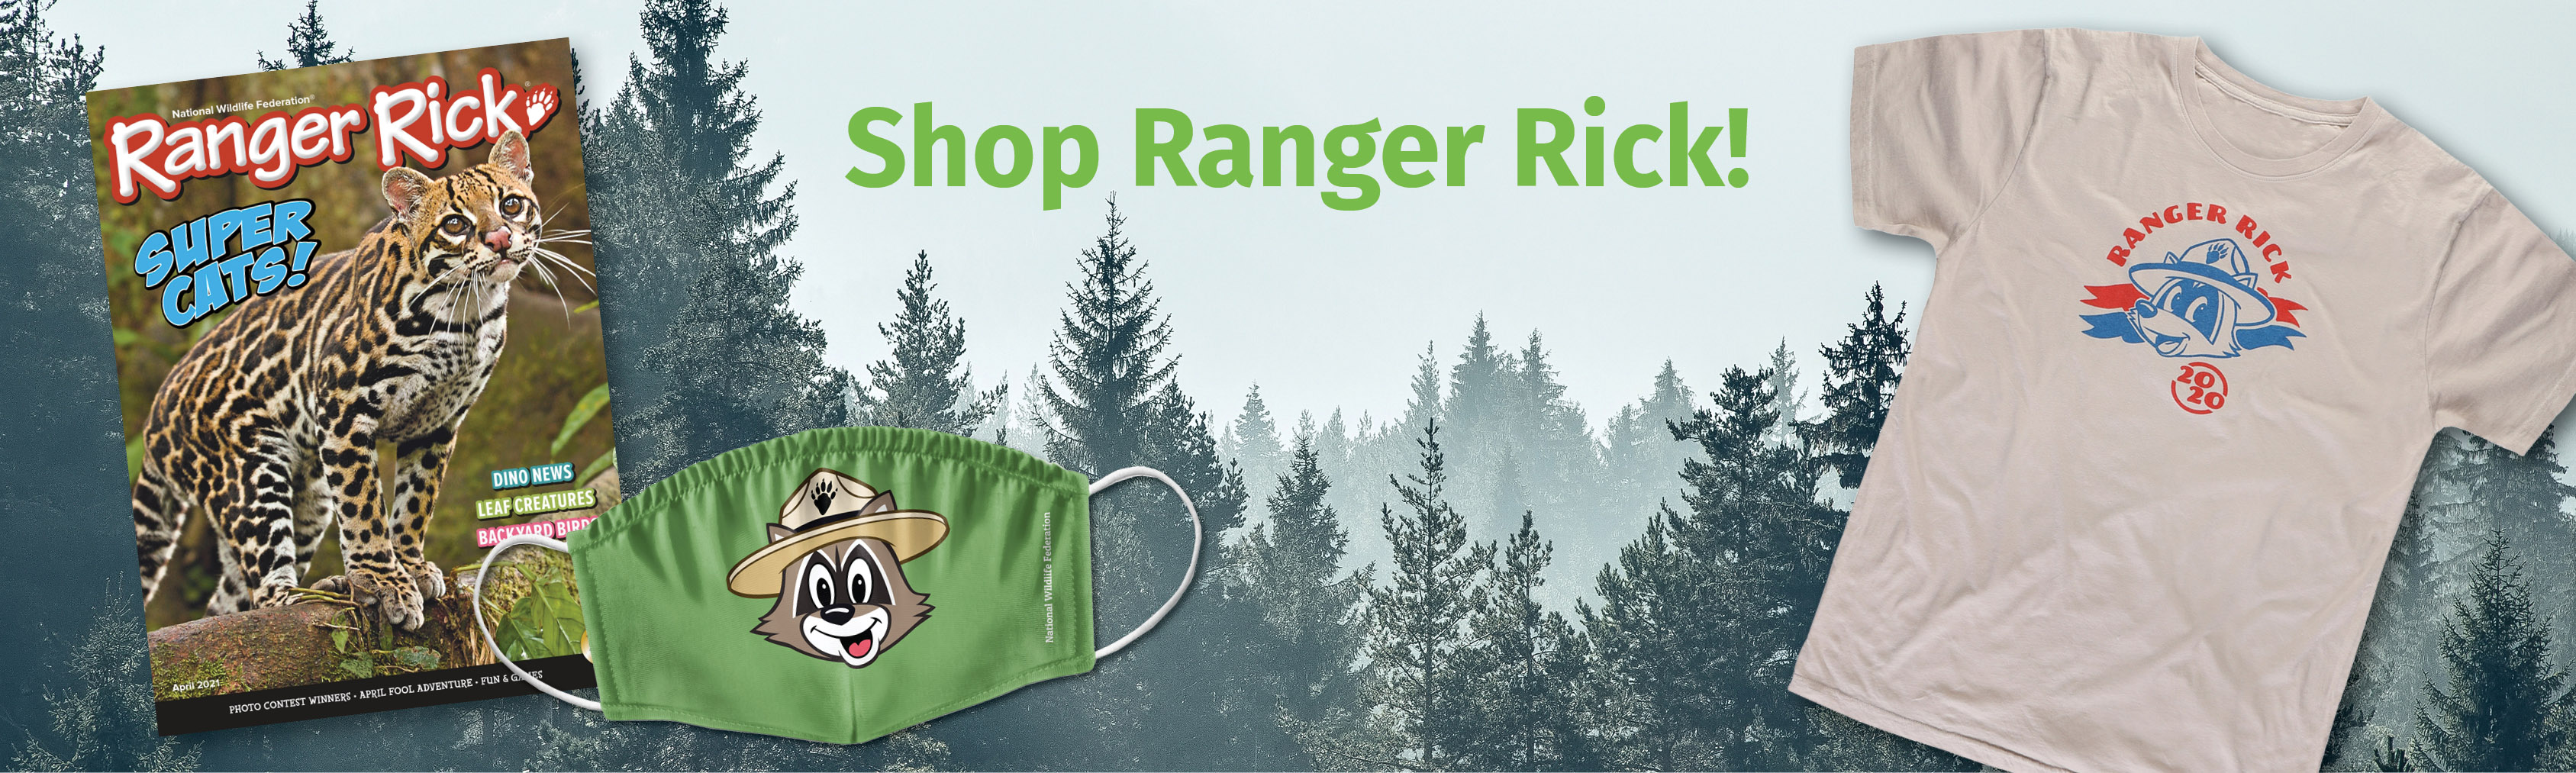 Ranger Rick header image